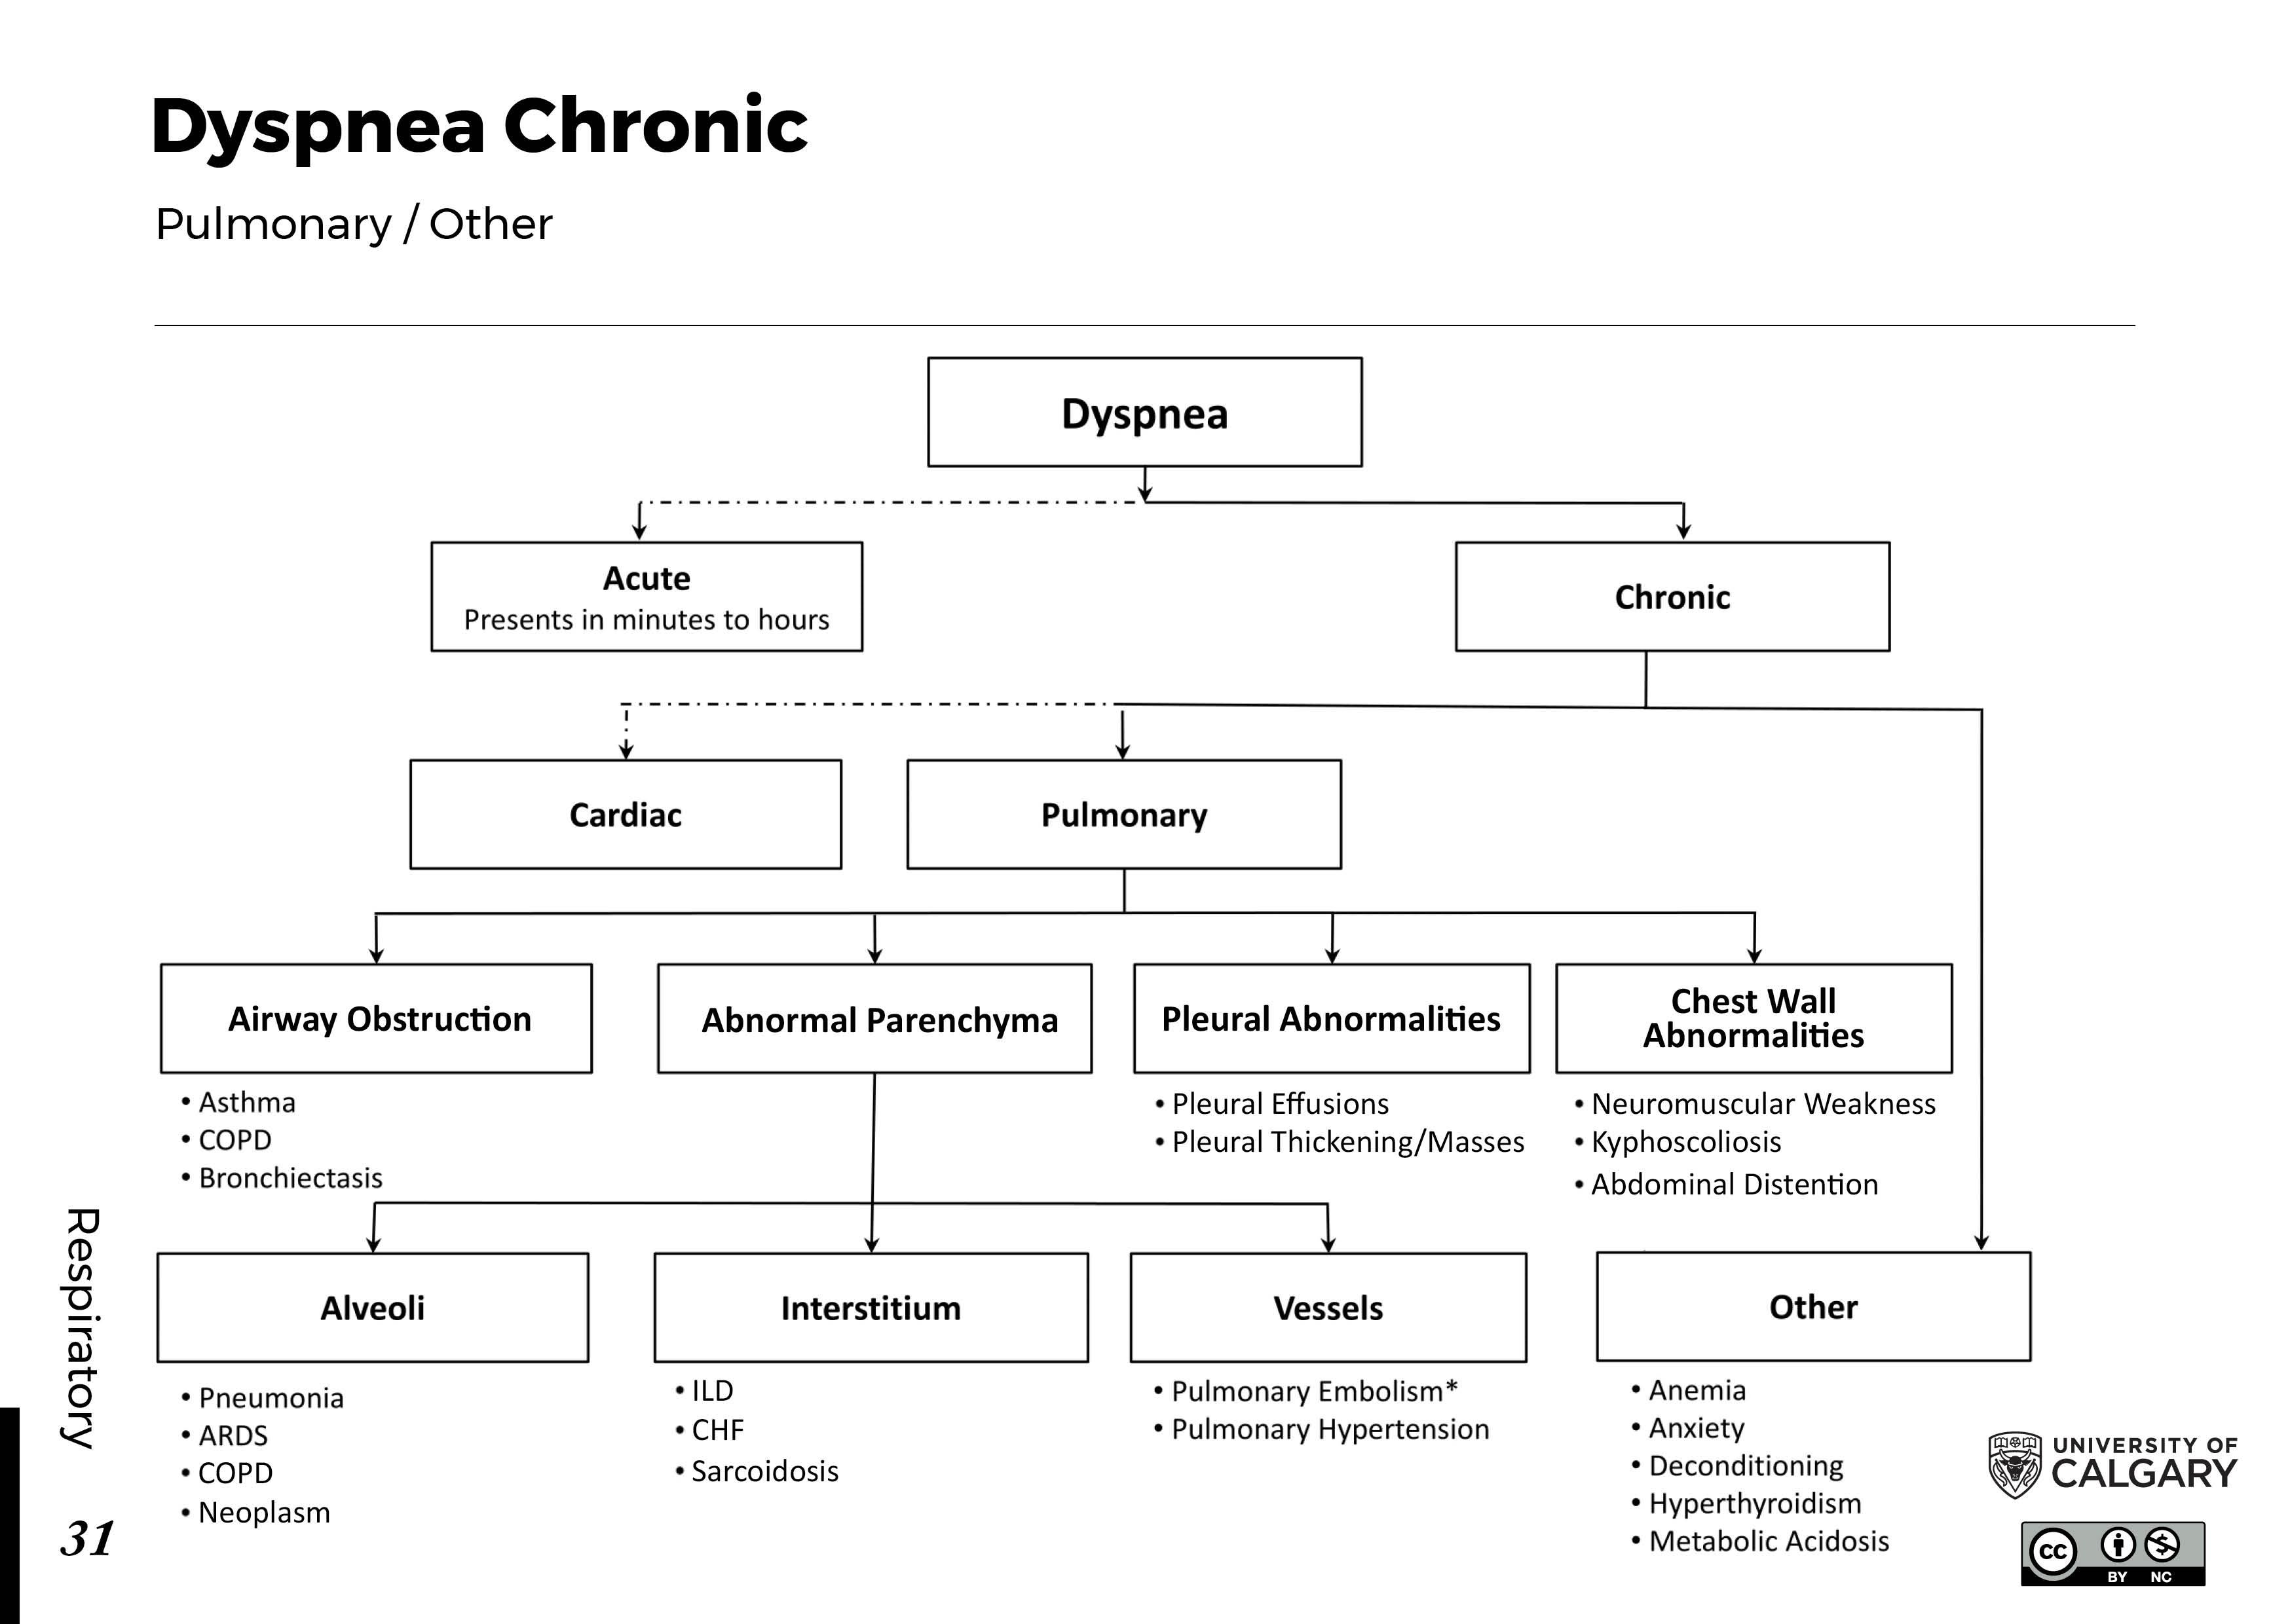 DYSPNEA: Chronic – Pulmonary/Other Scheme